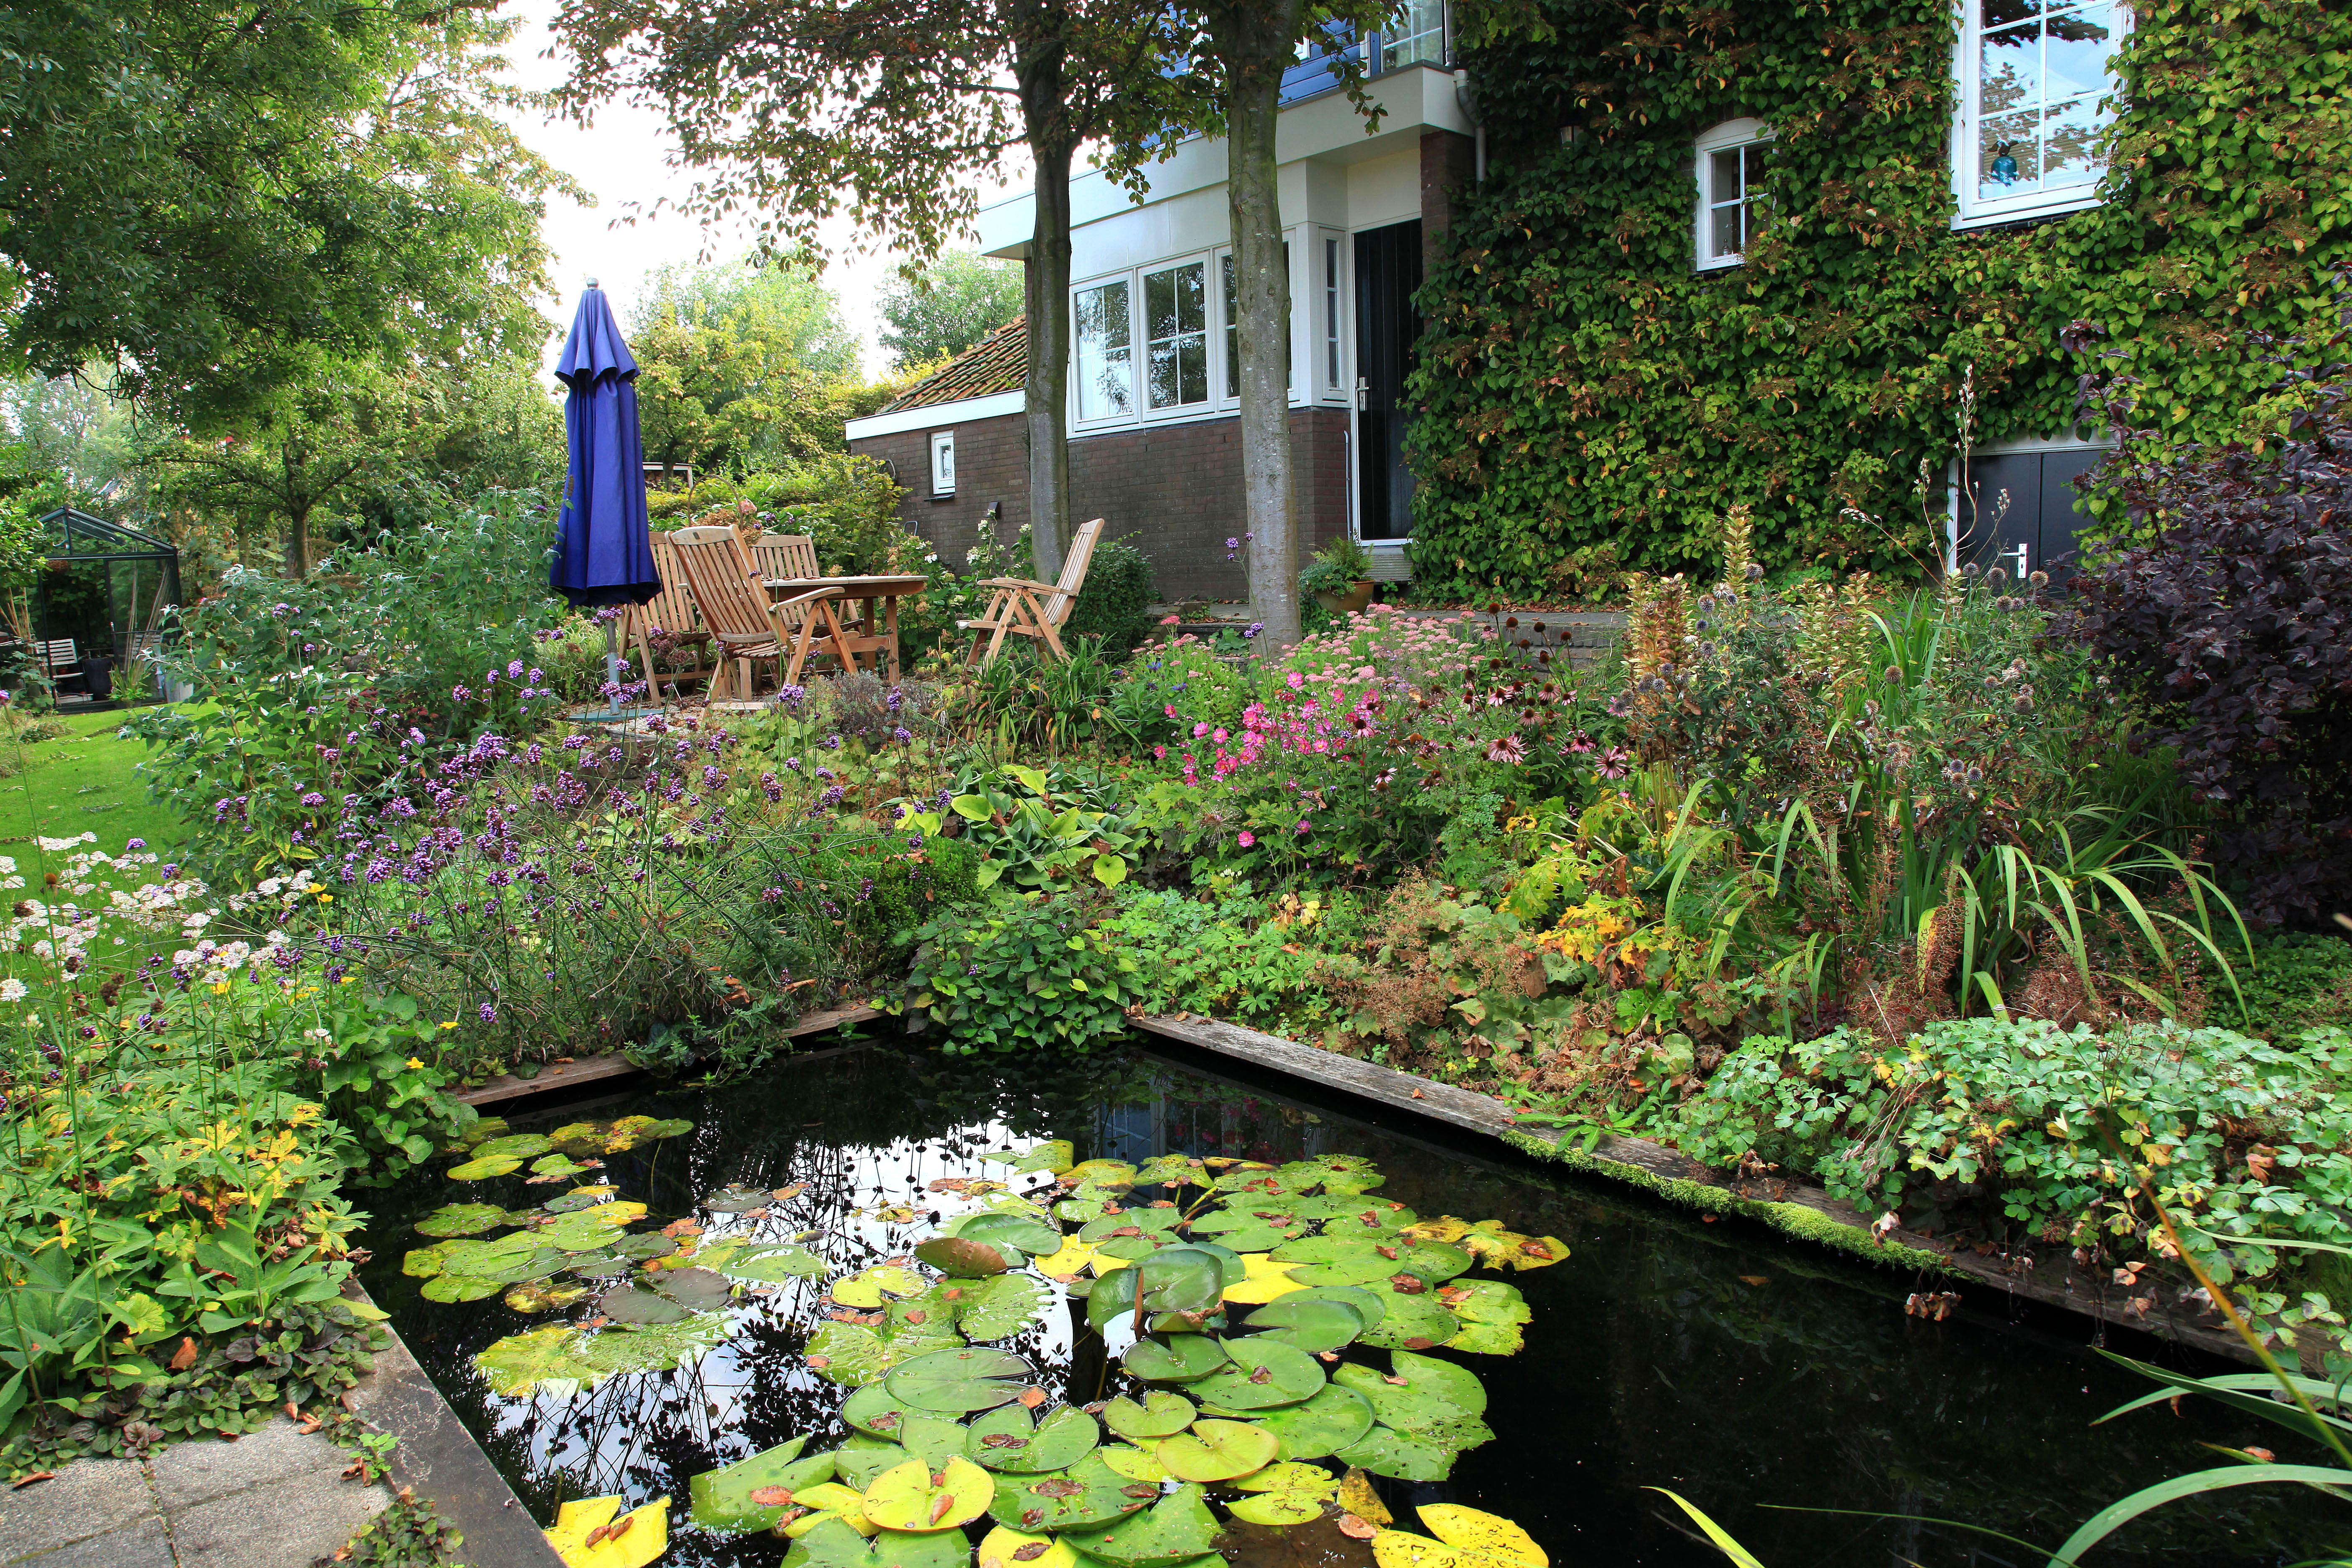 20 juni open tuindagen groei bloei hoeksche waard tuinenstruinen org - Tuin layout foto ...